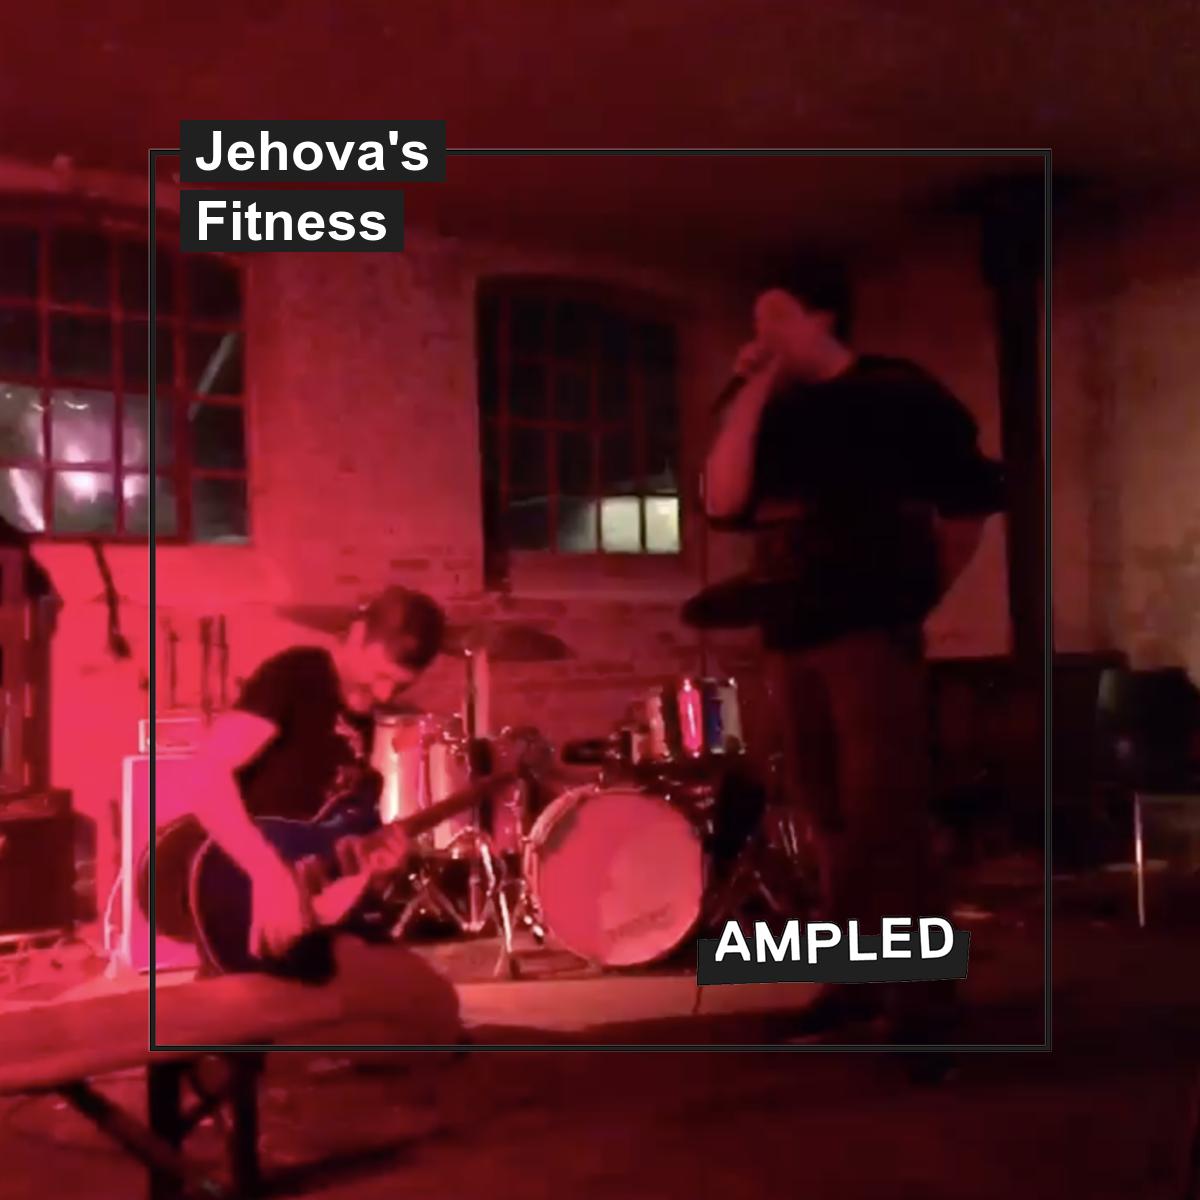 Jehova's Fitness